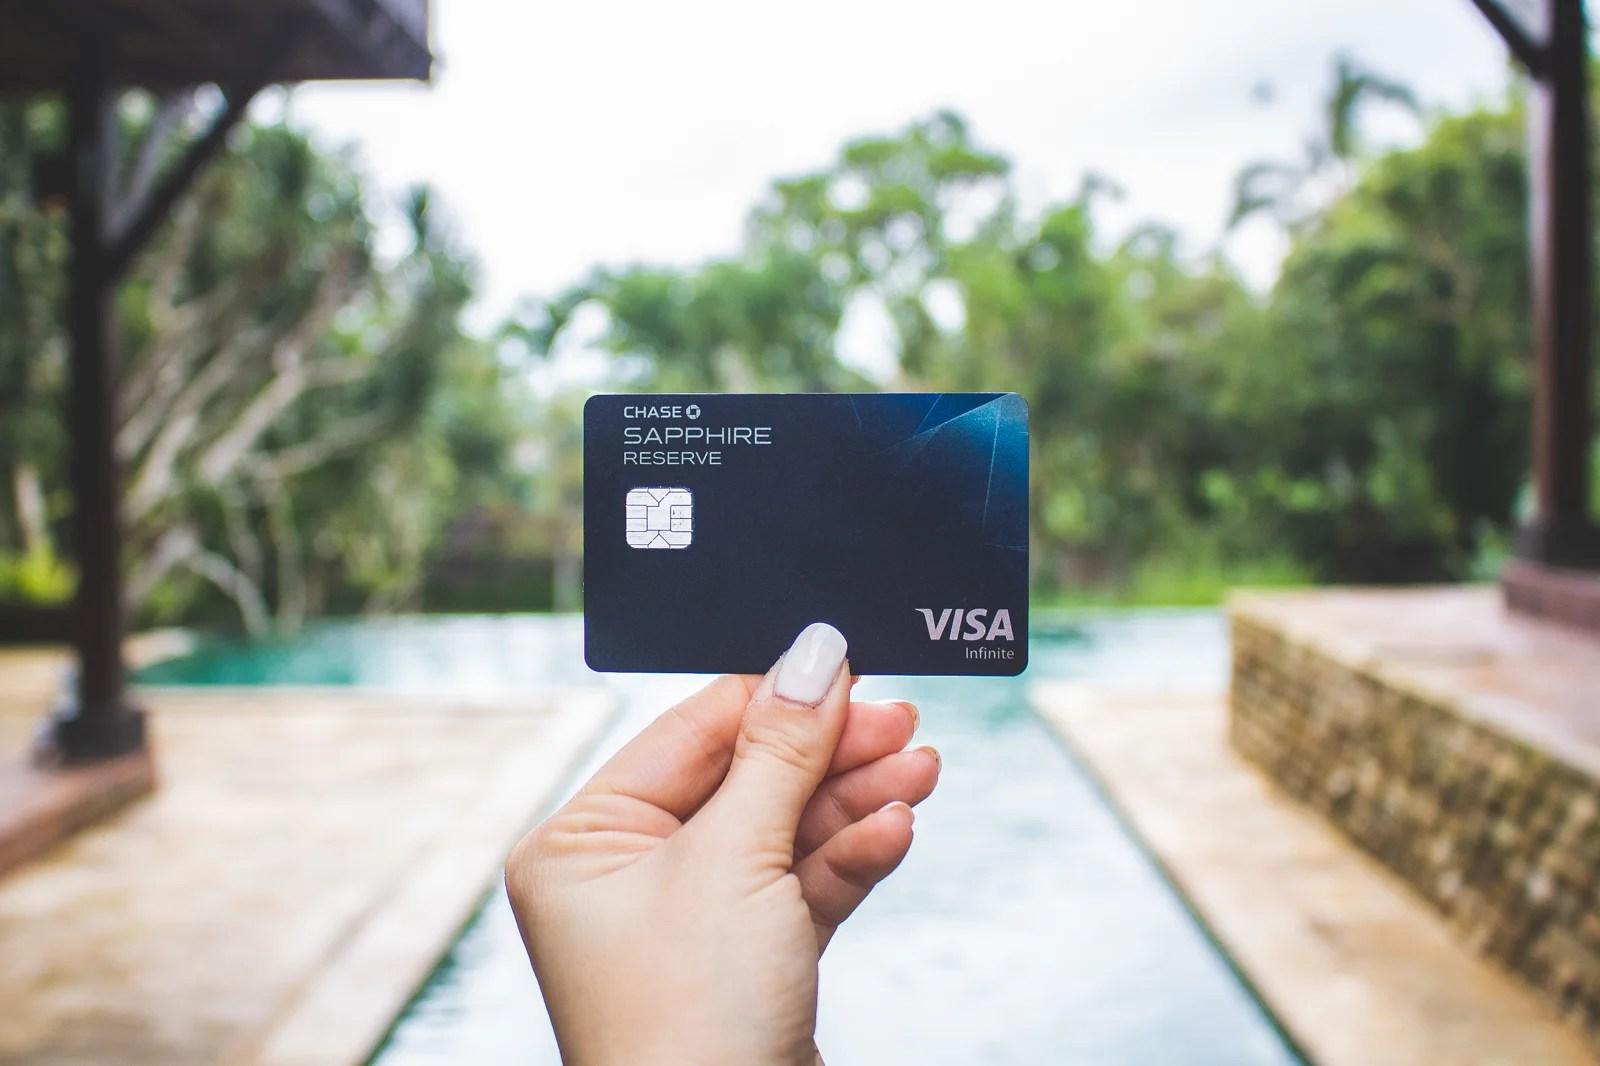 Микрокредиты на киви кошелек онлайн